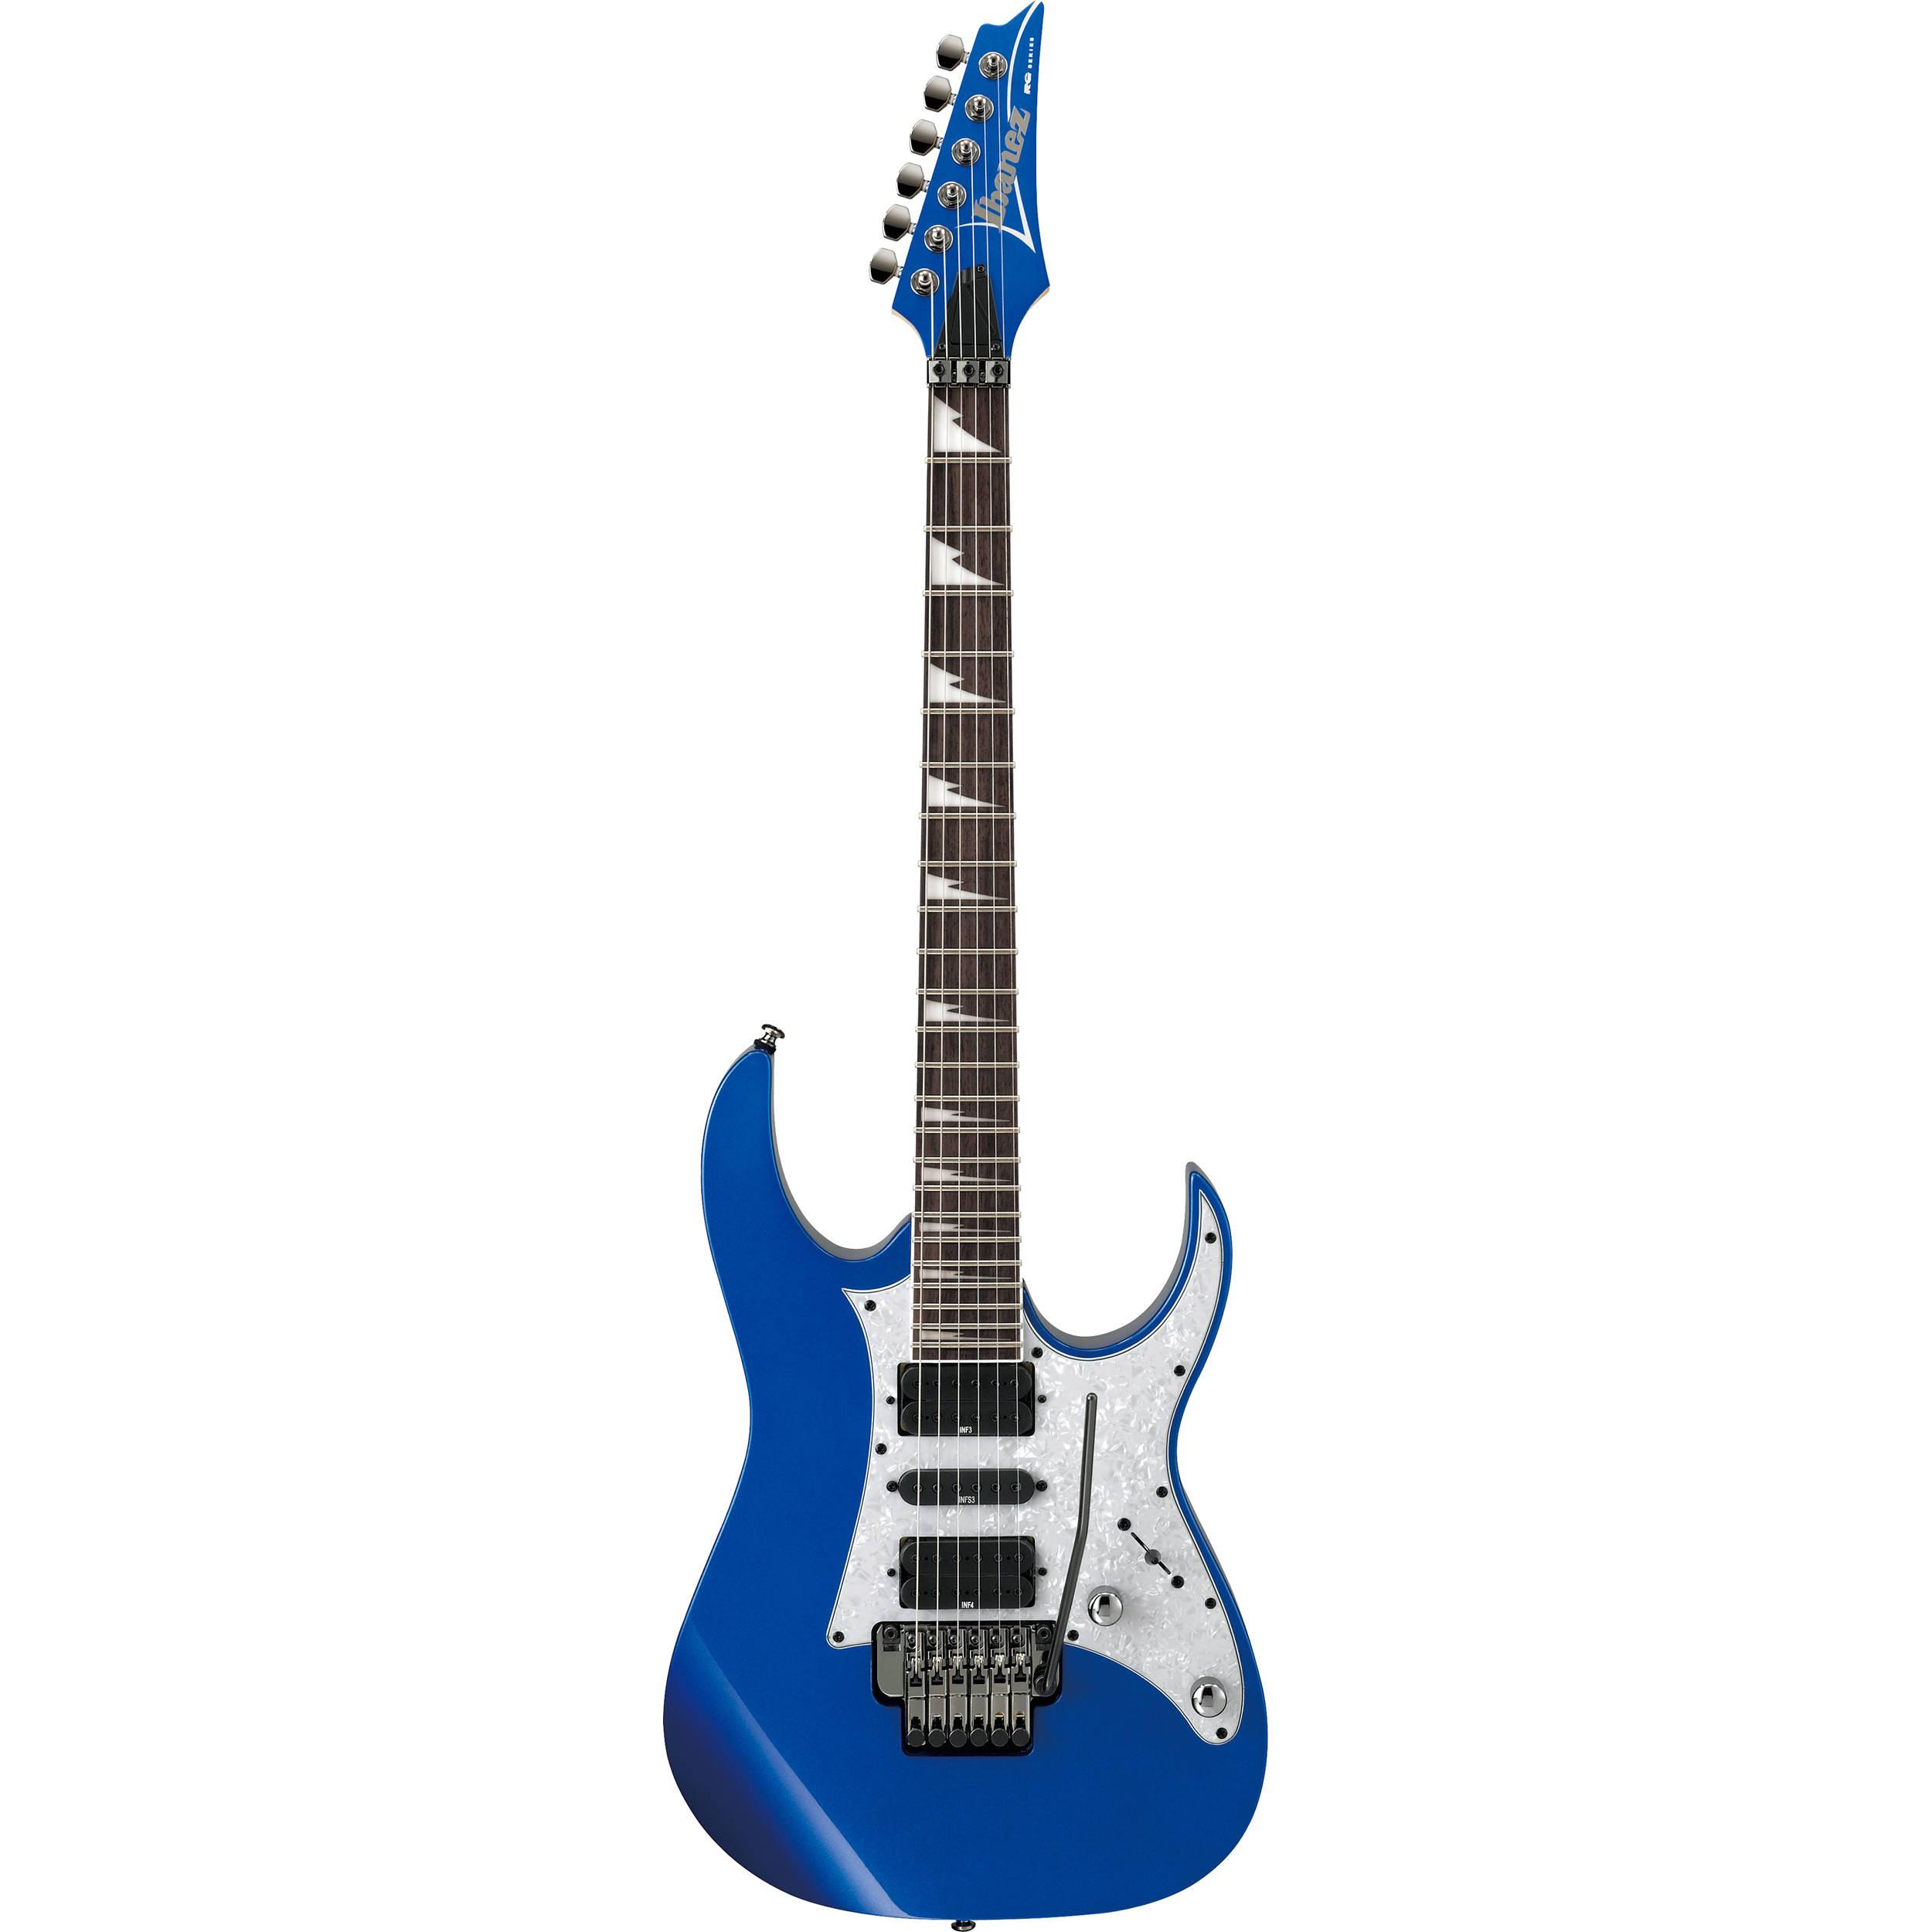 Ibanez RG450DX RG Series Electric Guitar (Starlight Blue)